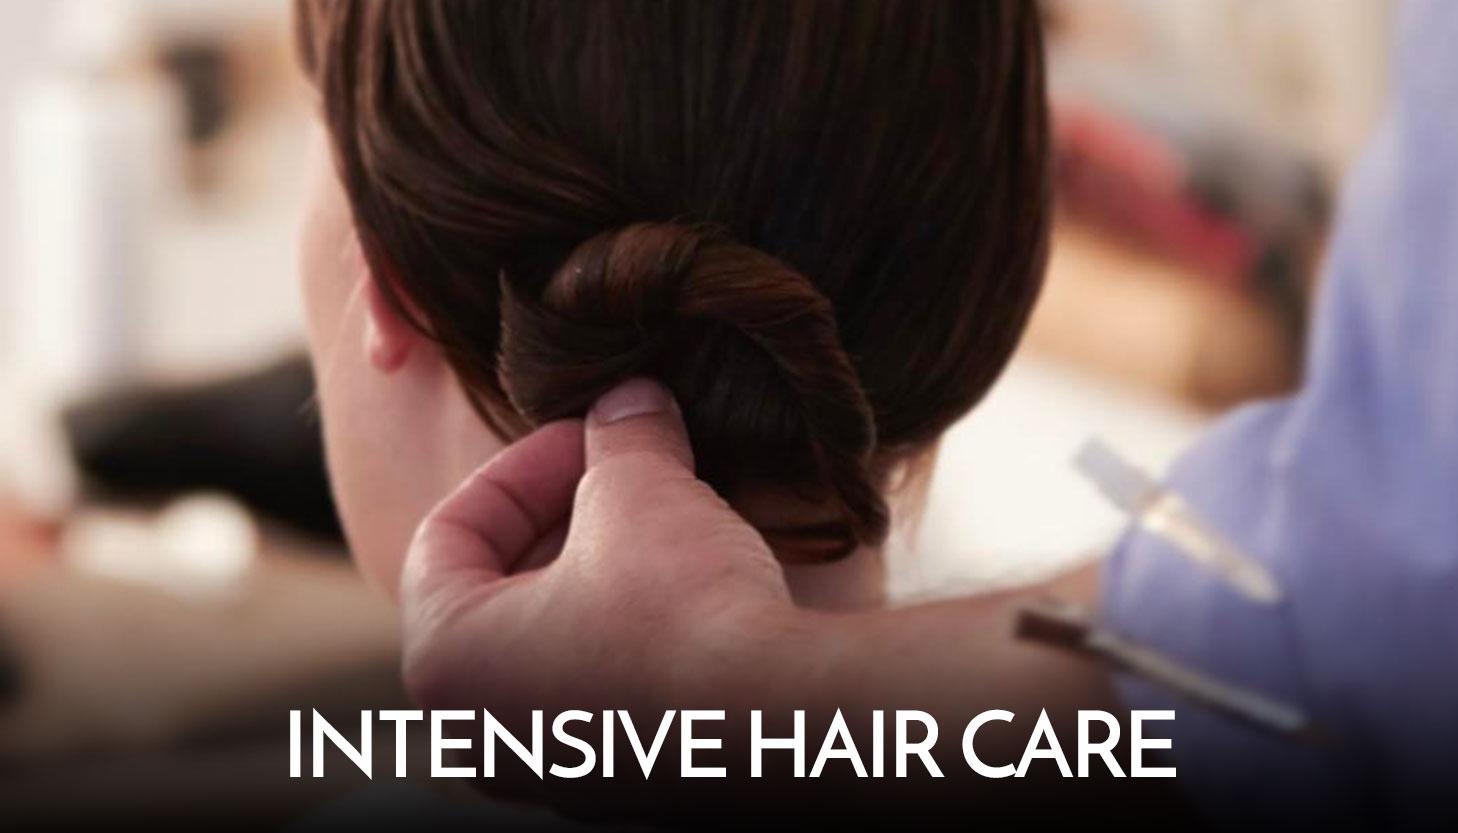 Intensive-hair-care